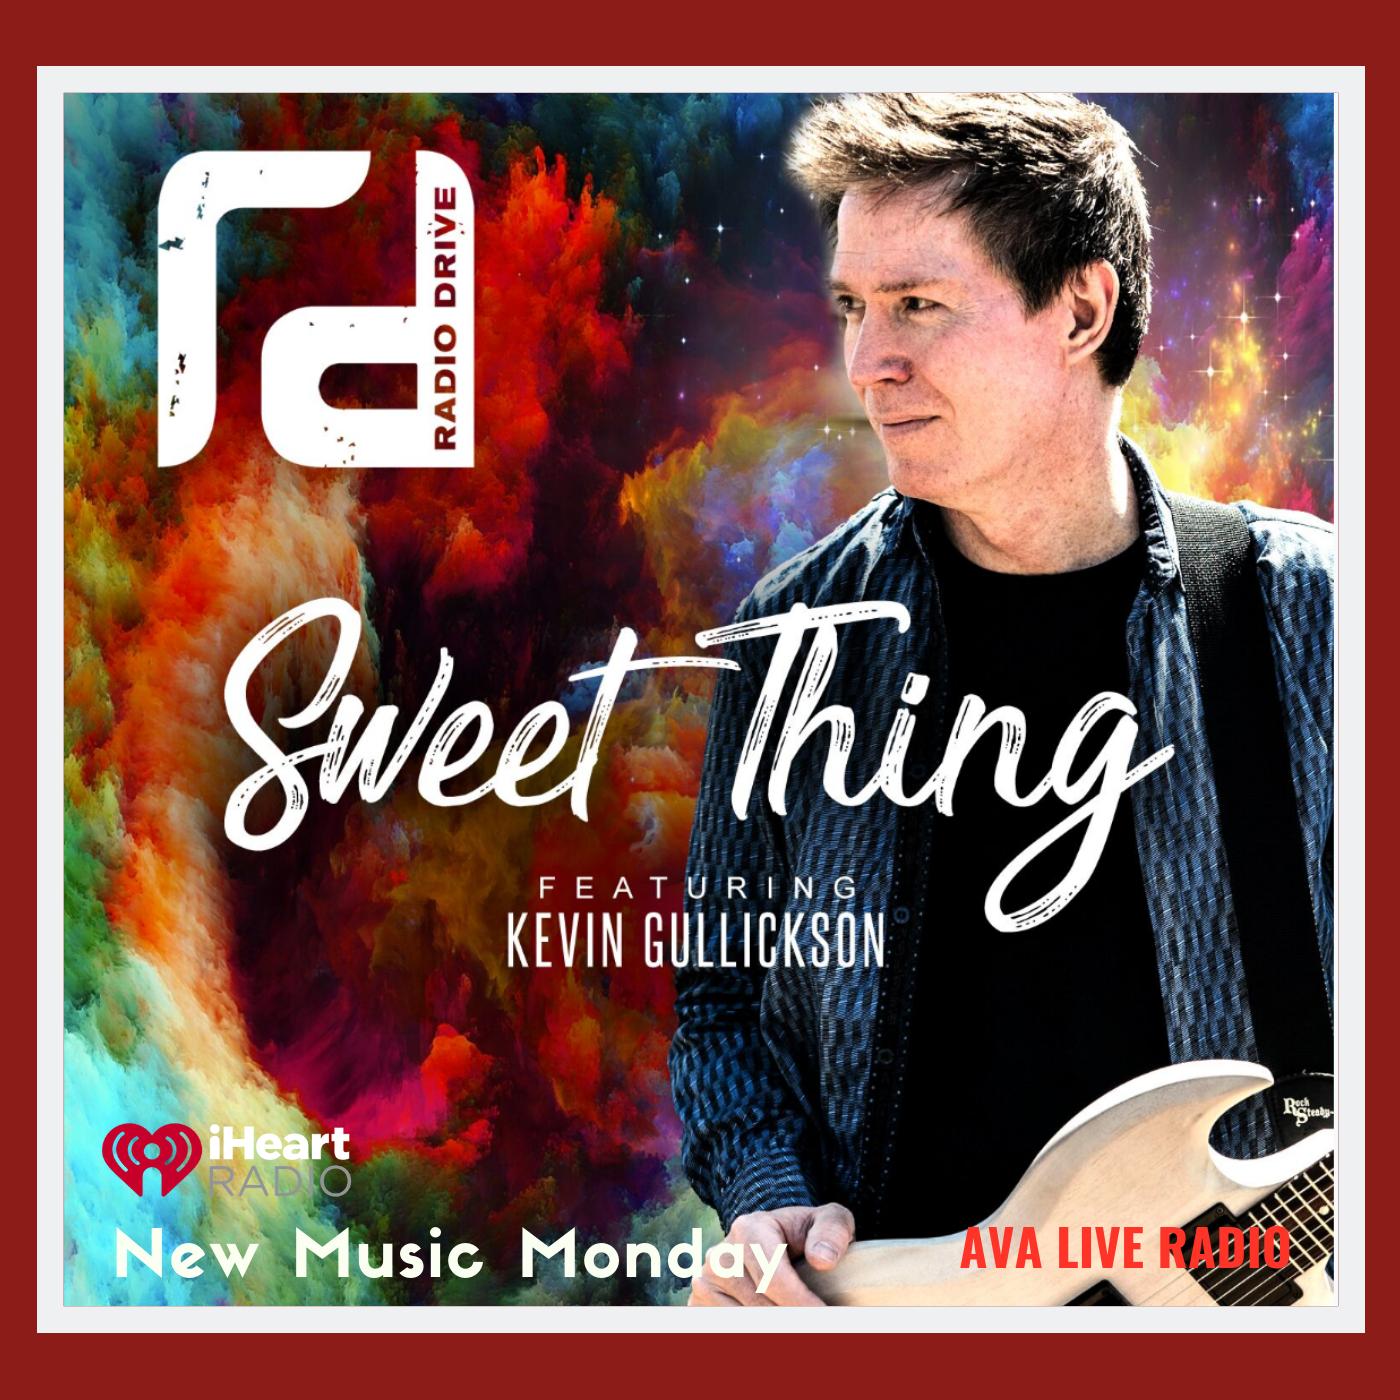 Radio Drive sweet thing avaliveradio .png